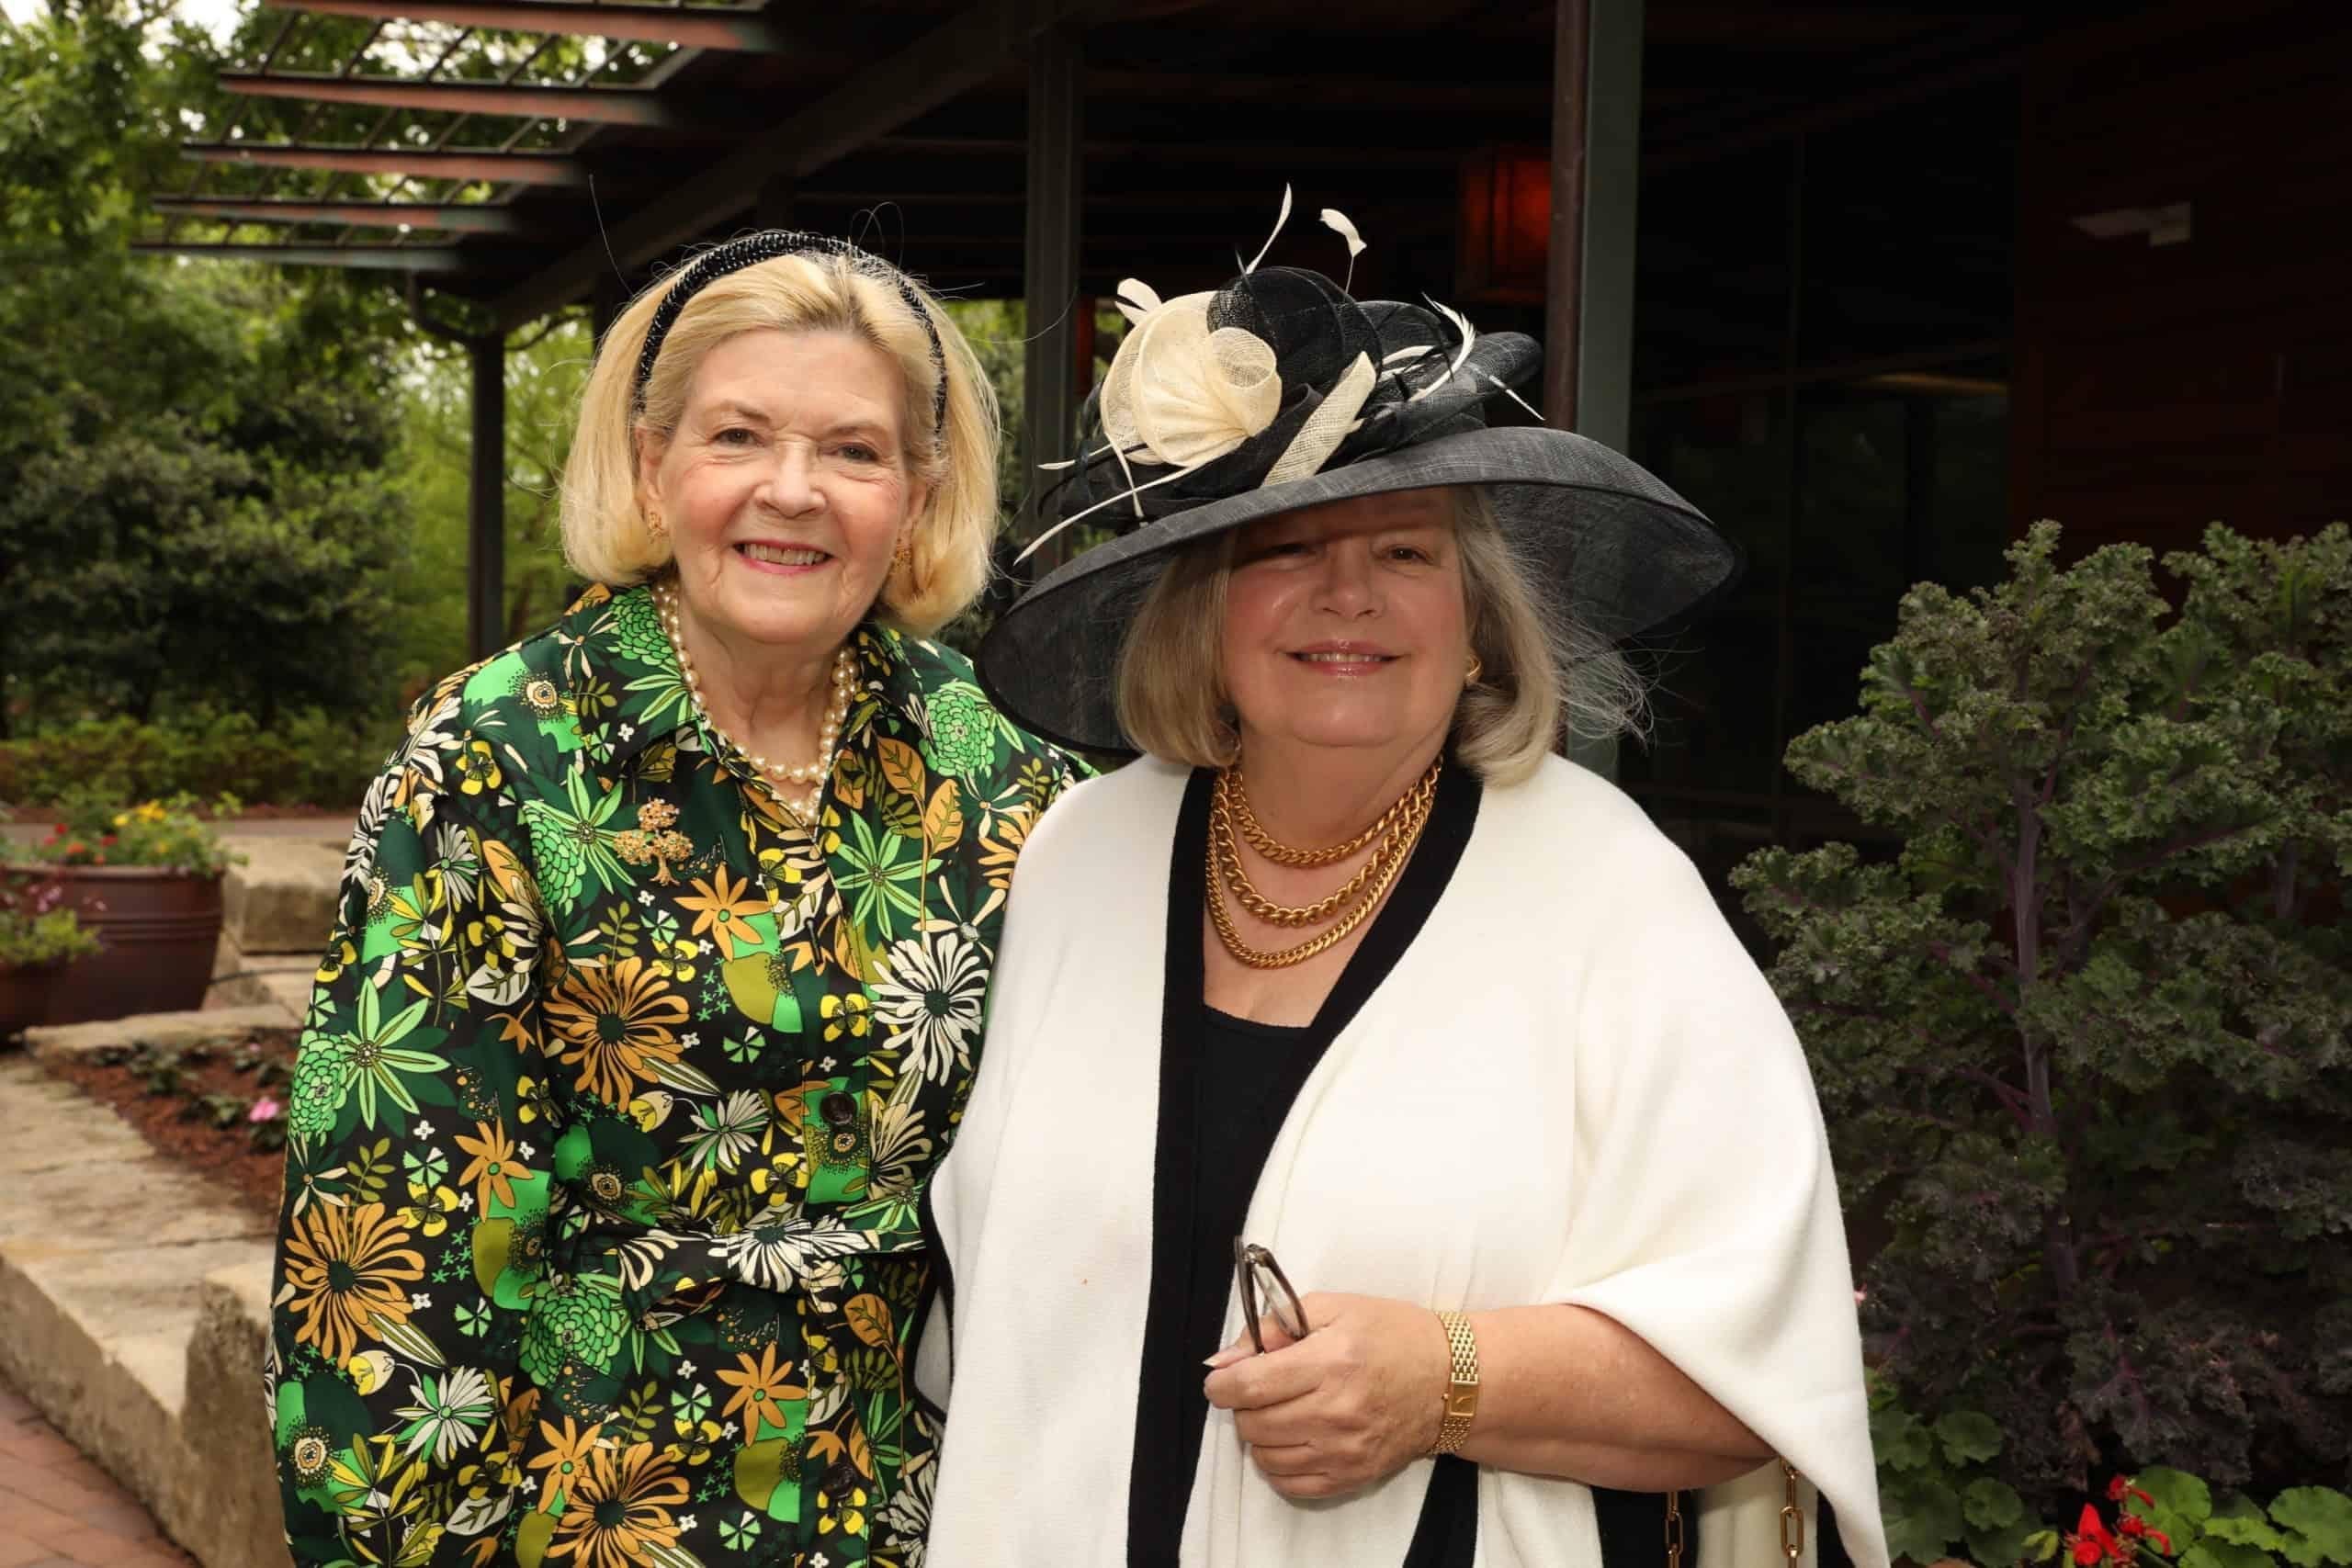 Dorothea Meltzer and Sandy Secor